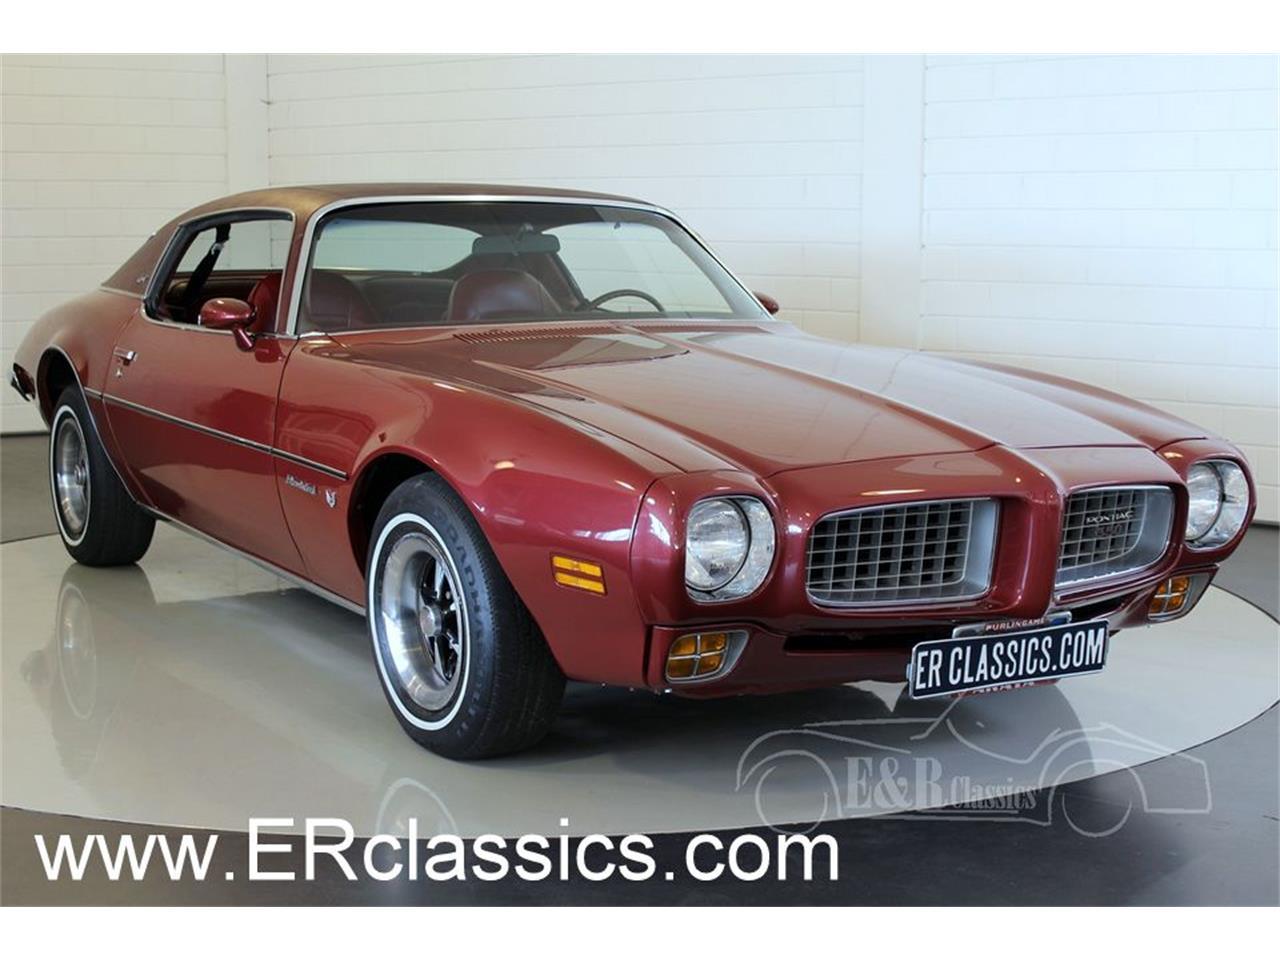 1973 Pontiac Firebird Esprit